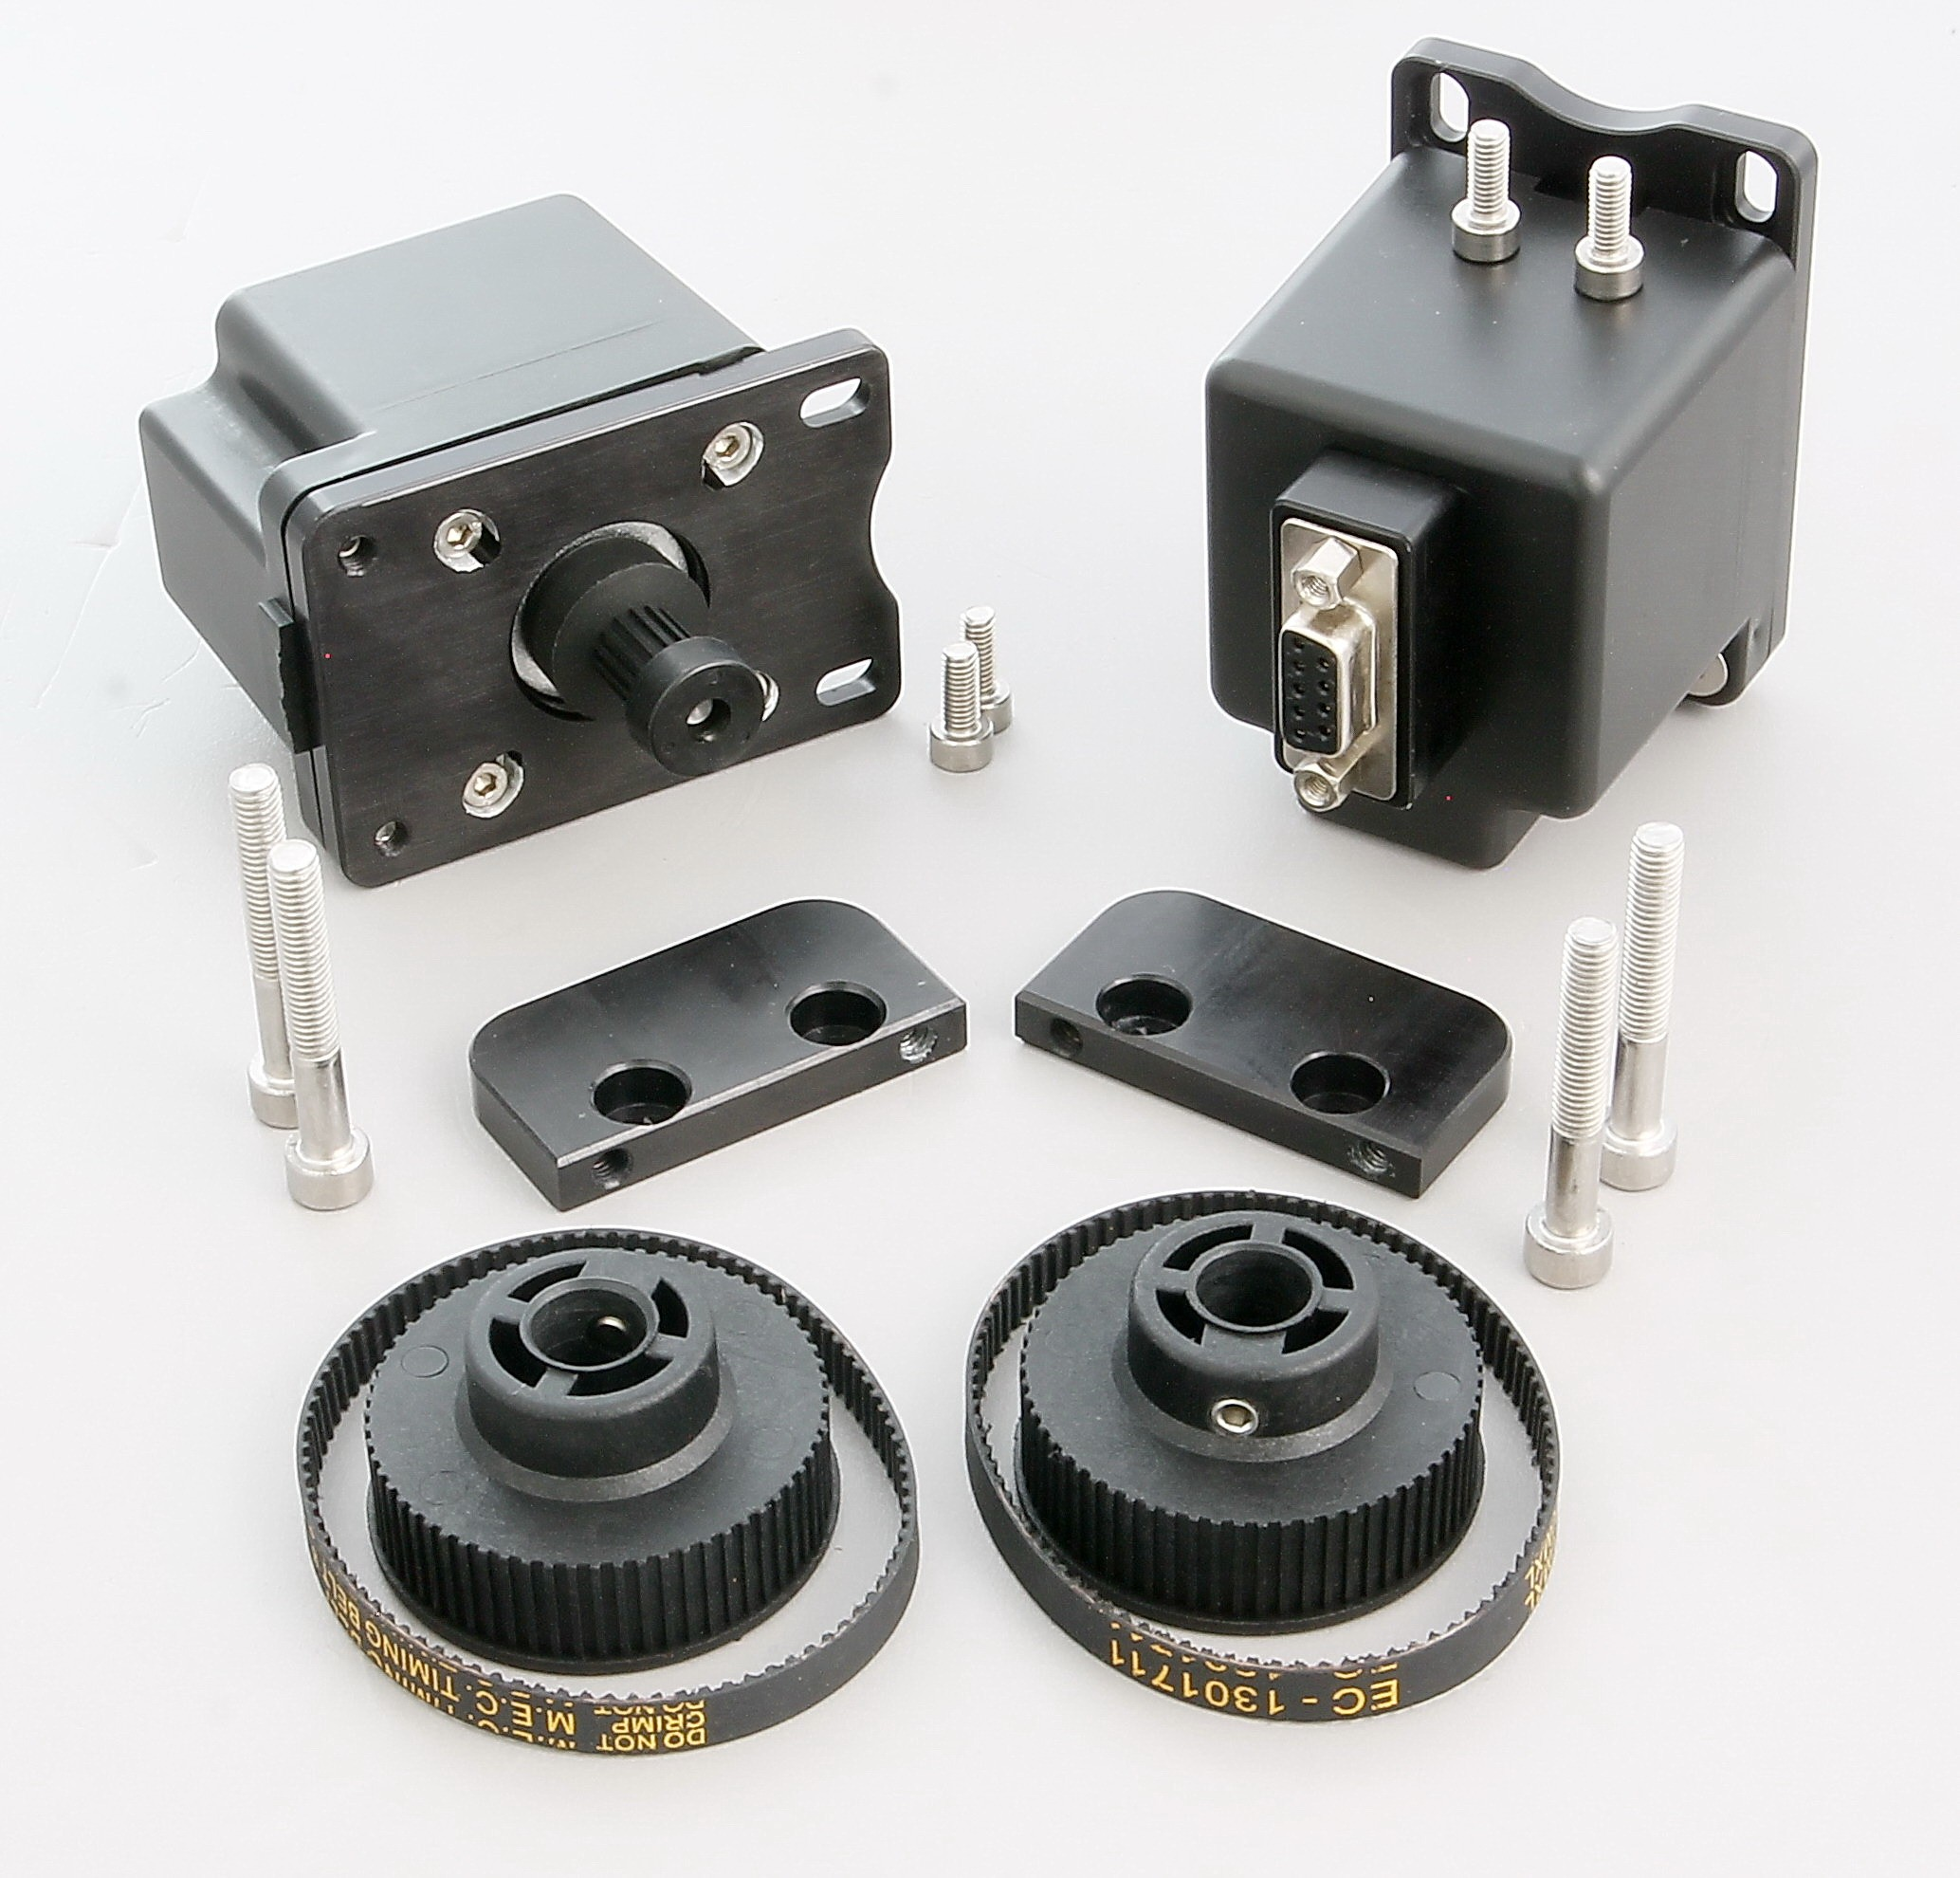 Kit coppia motori per montature TREX. (Offerta valida con kit Stargo AVSTARGO)